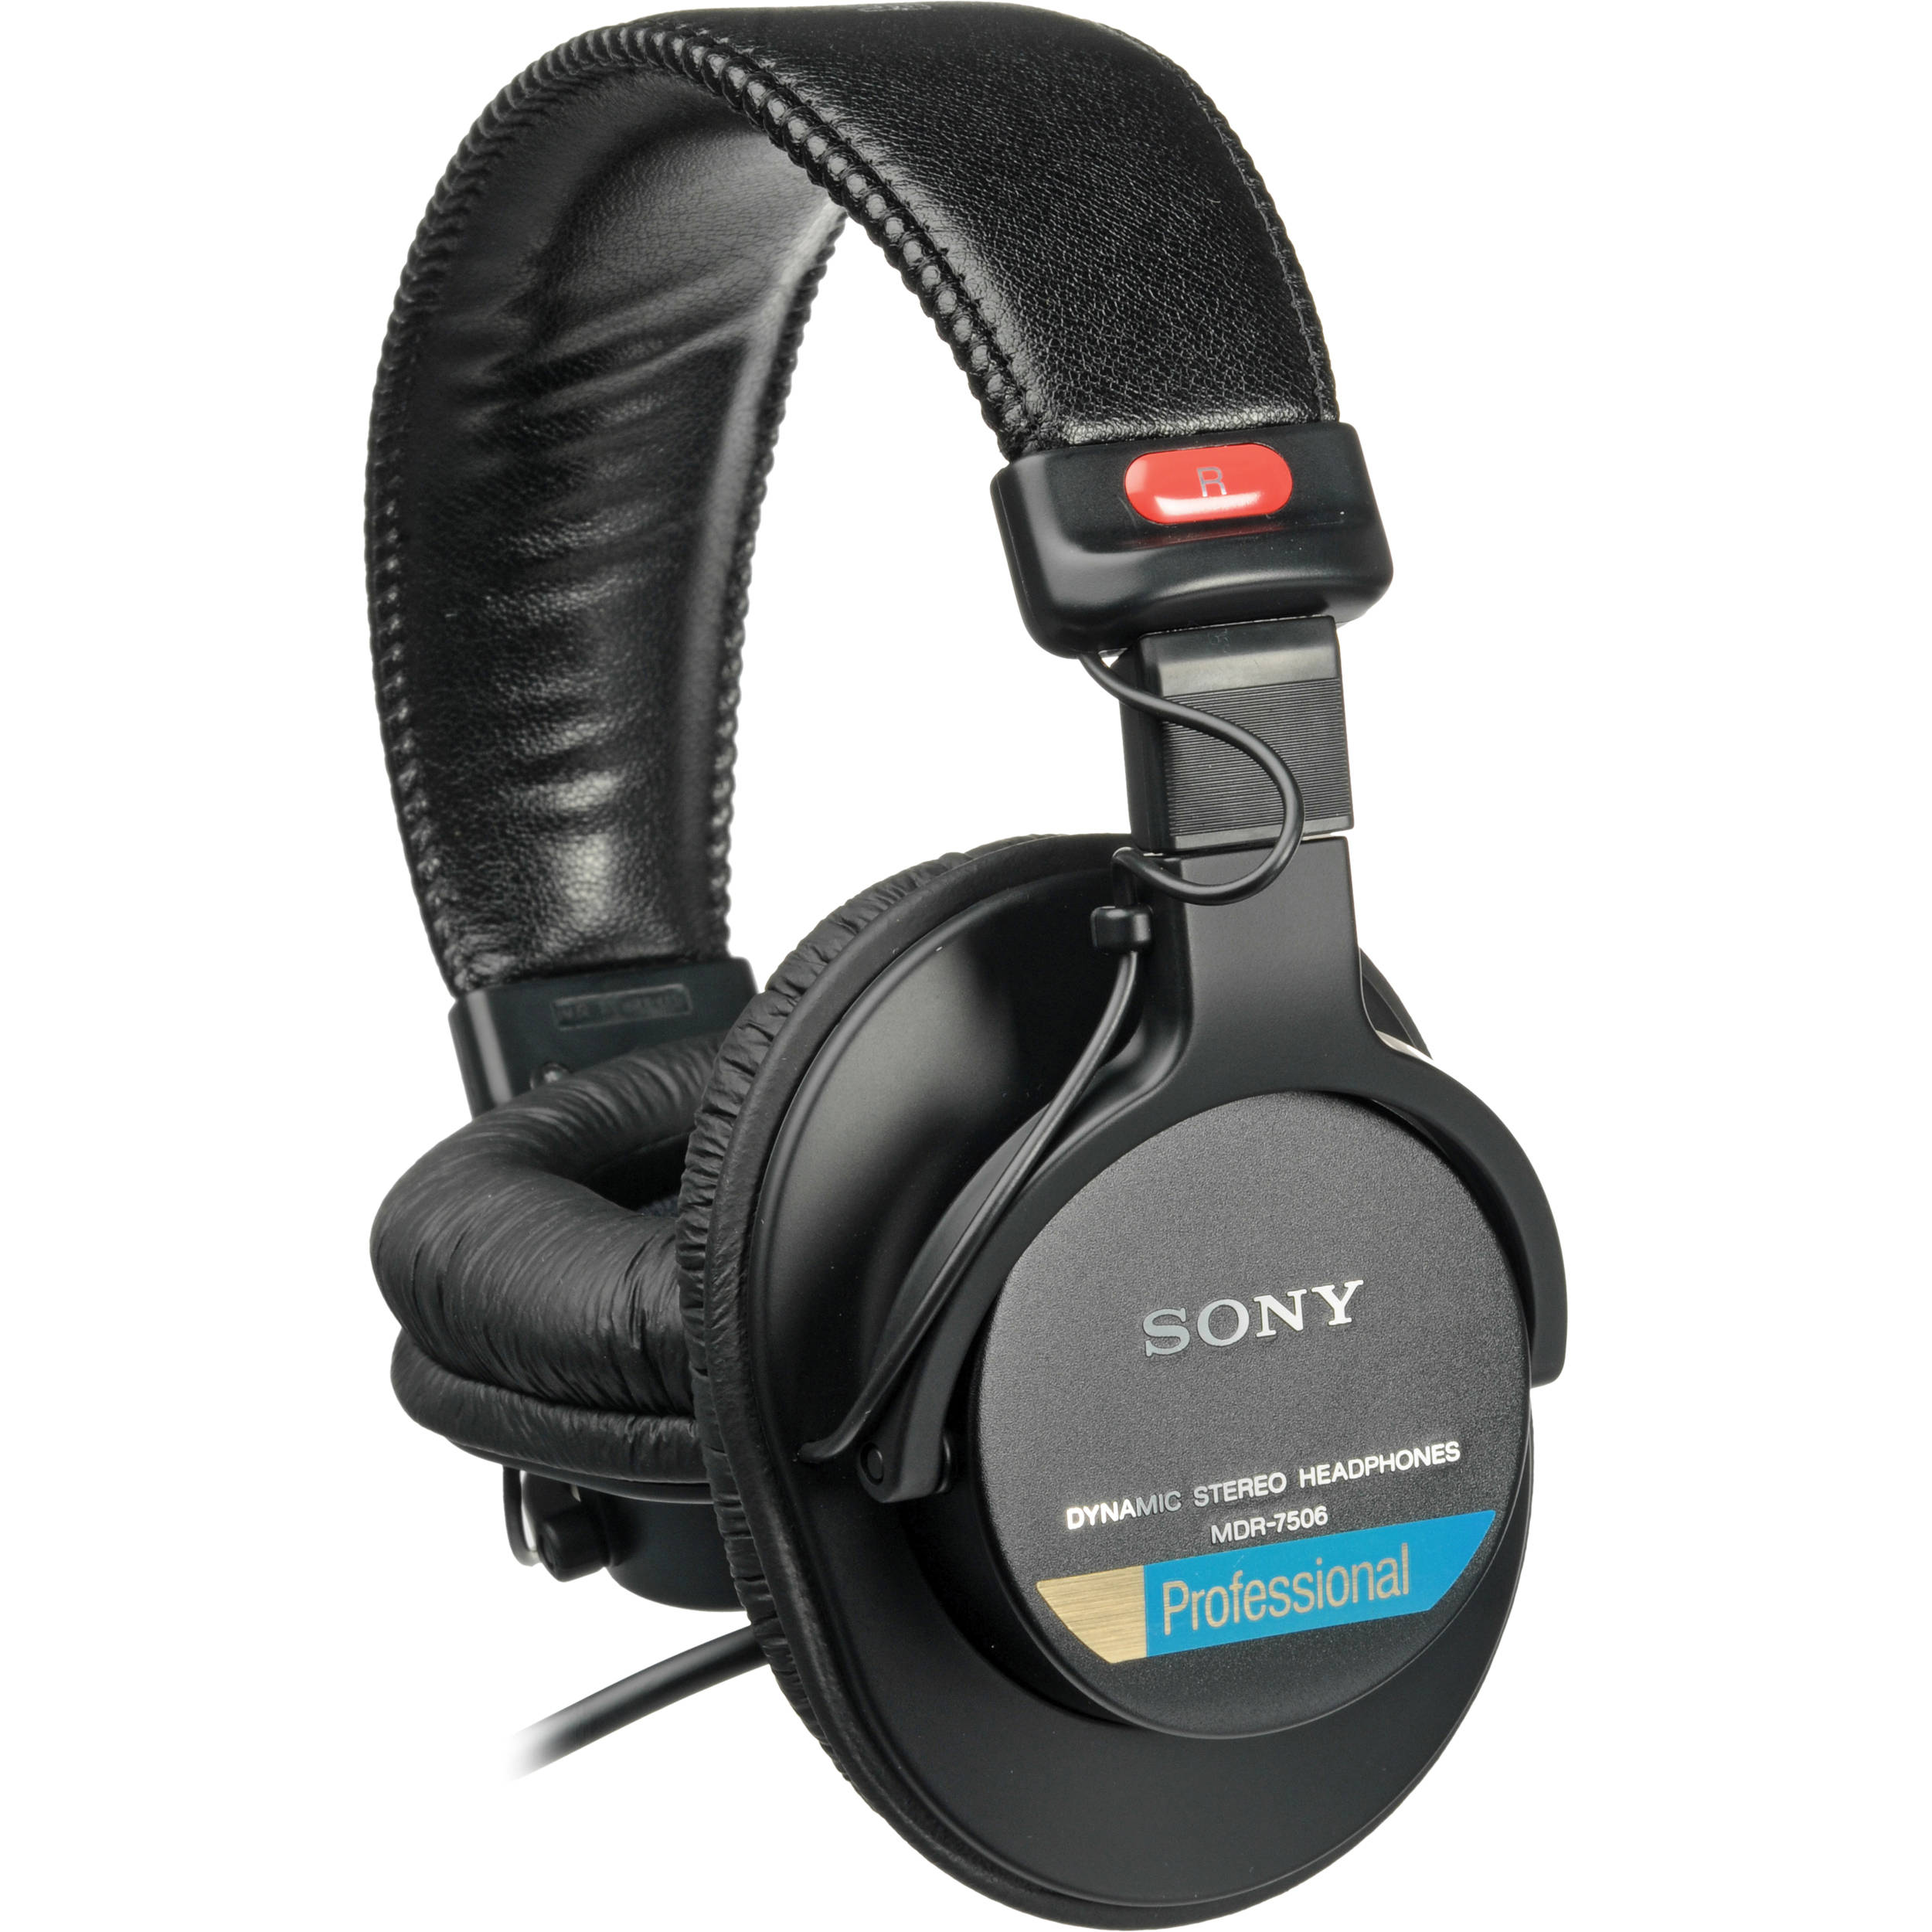 Sony Mdr 7506 Headphones Mdr 7506 B H Photo Video